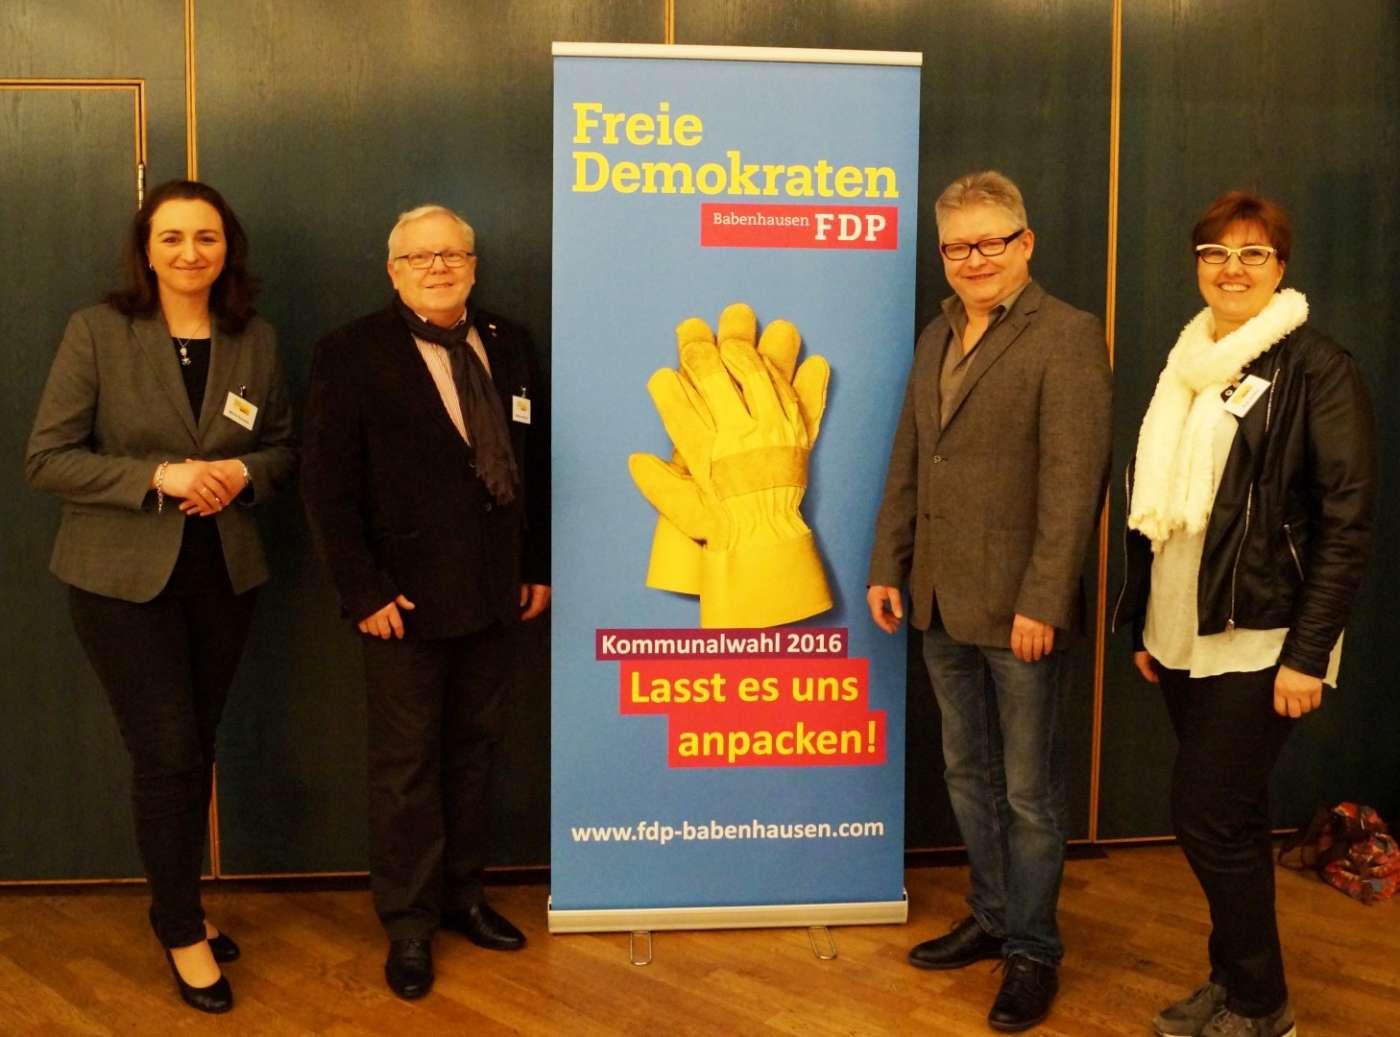 FDP_11.01.2016_3 (Large)